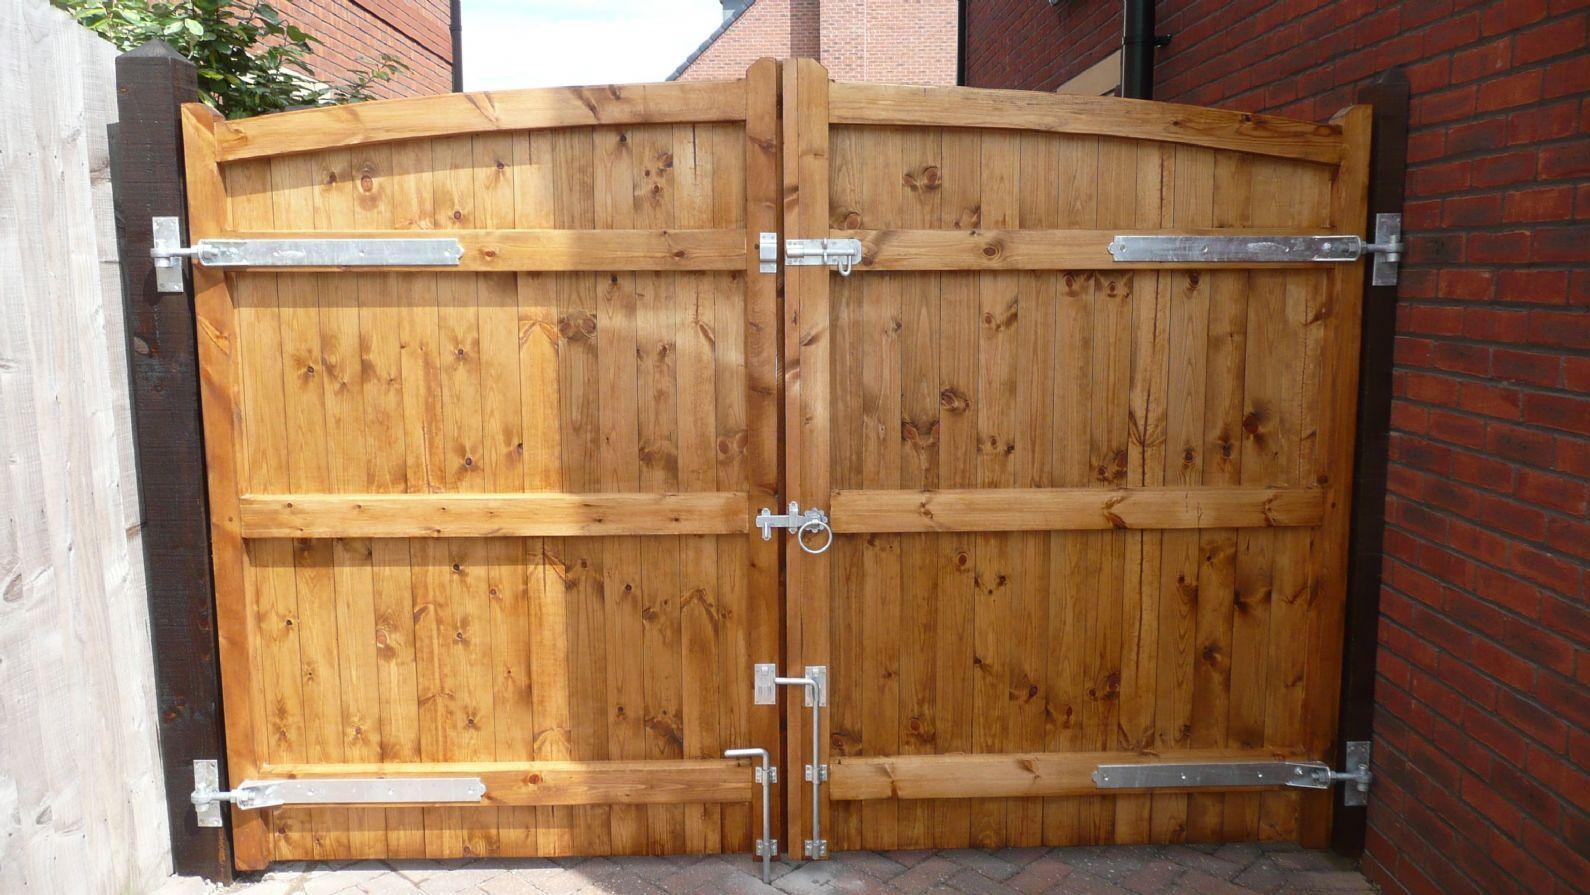 Wooden Driveway Gate Hardware Driveway gate, Wooden